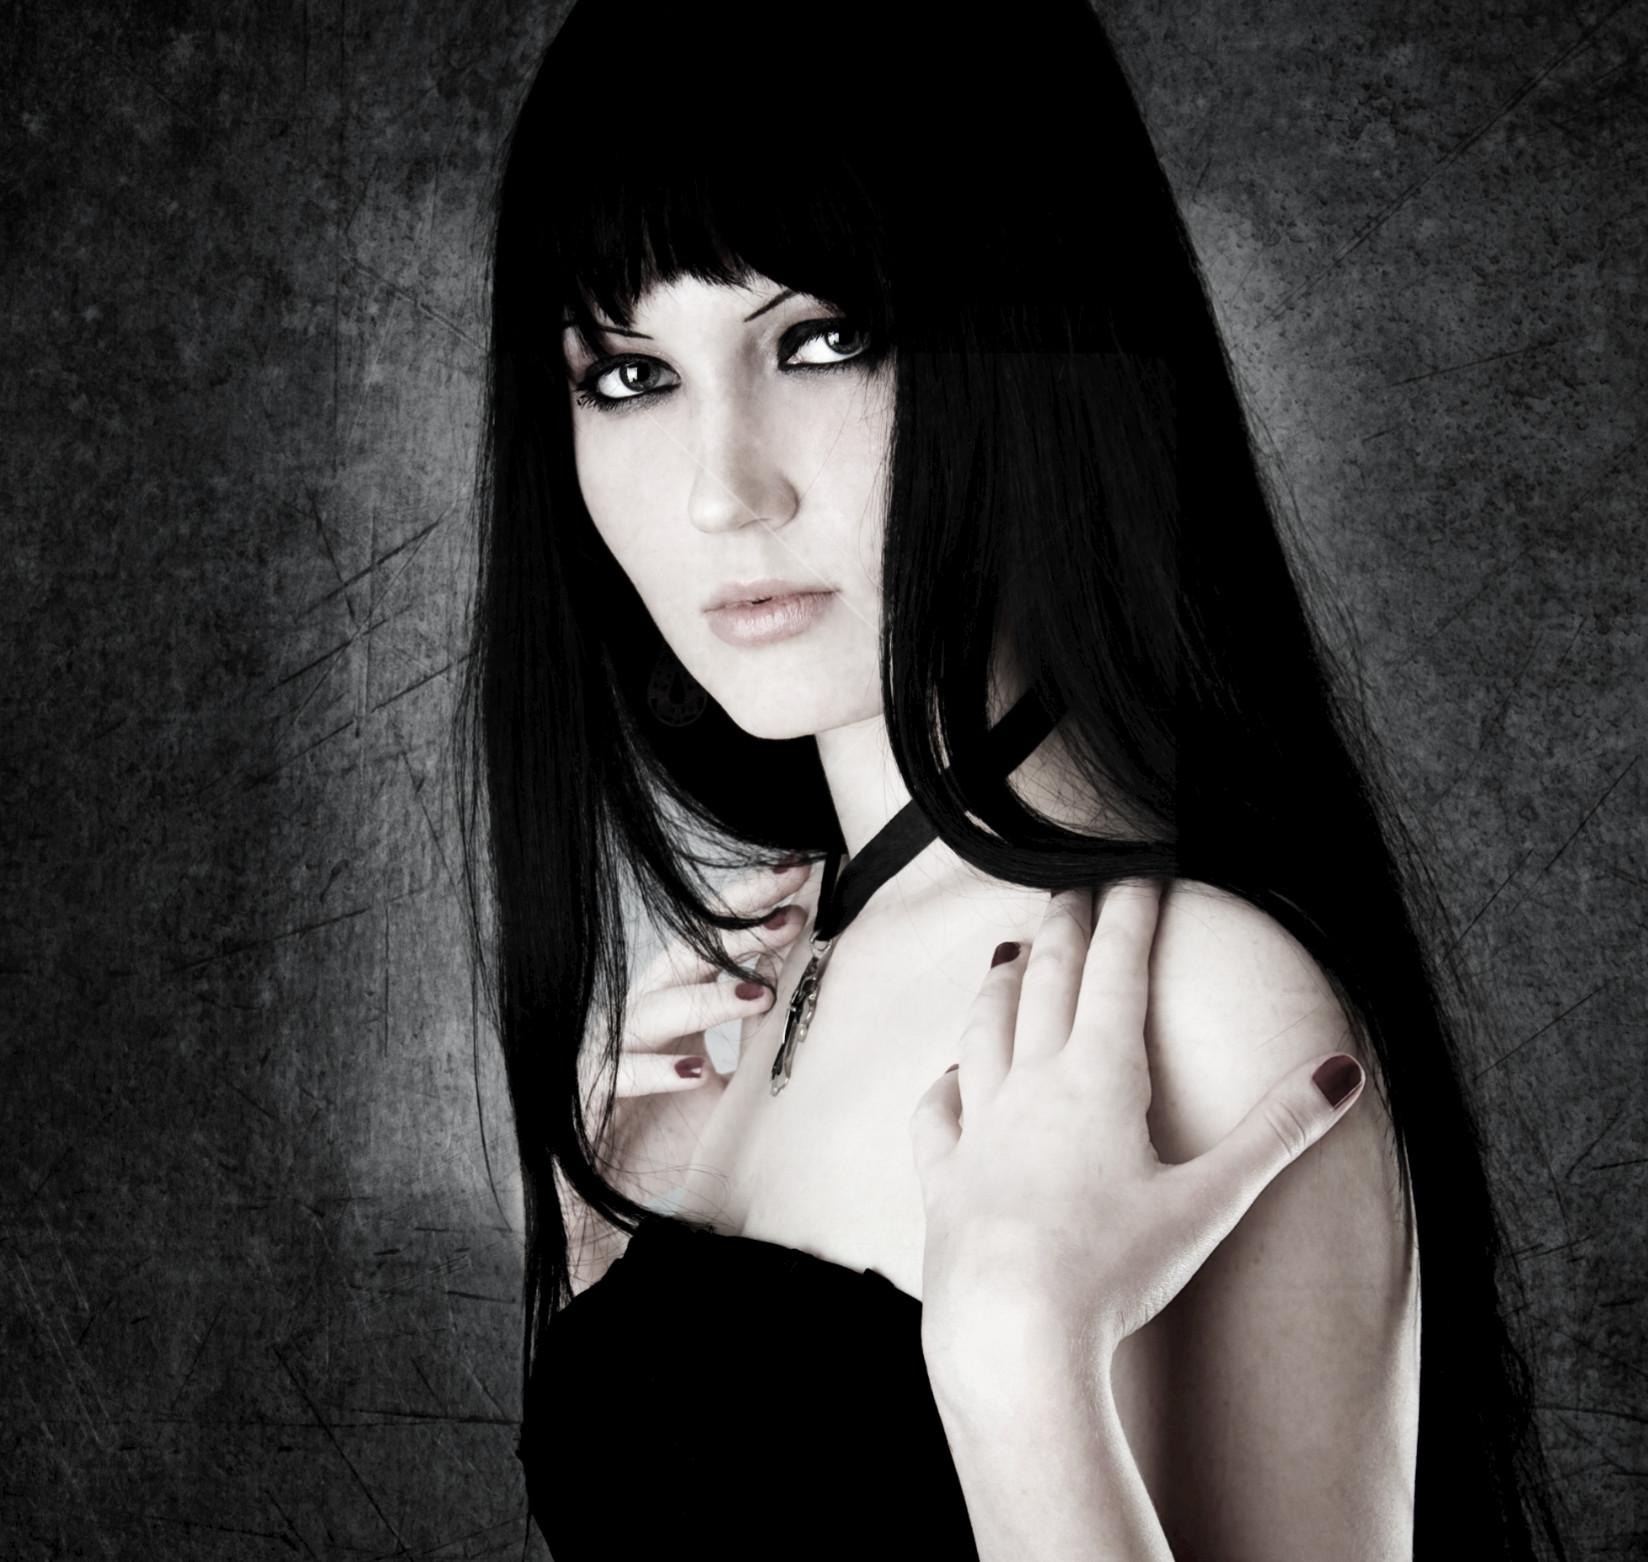 Brenda Pandos & The Vampires